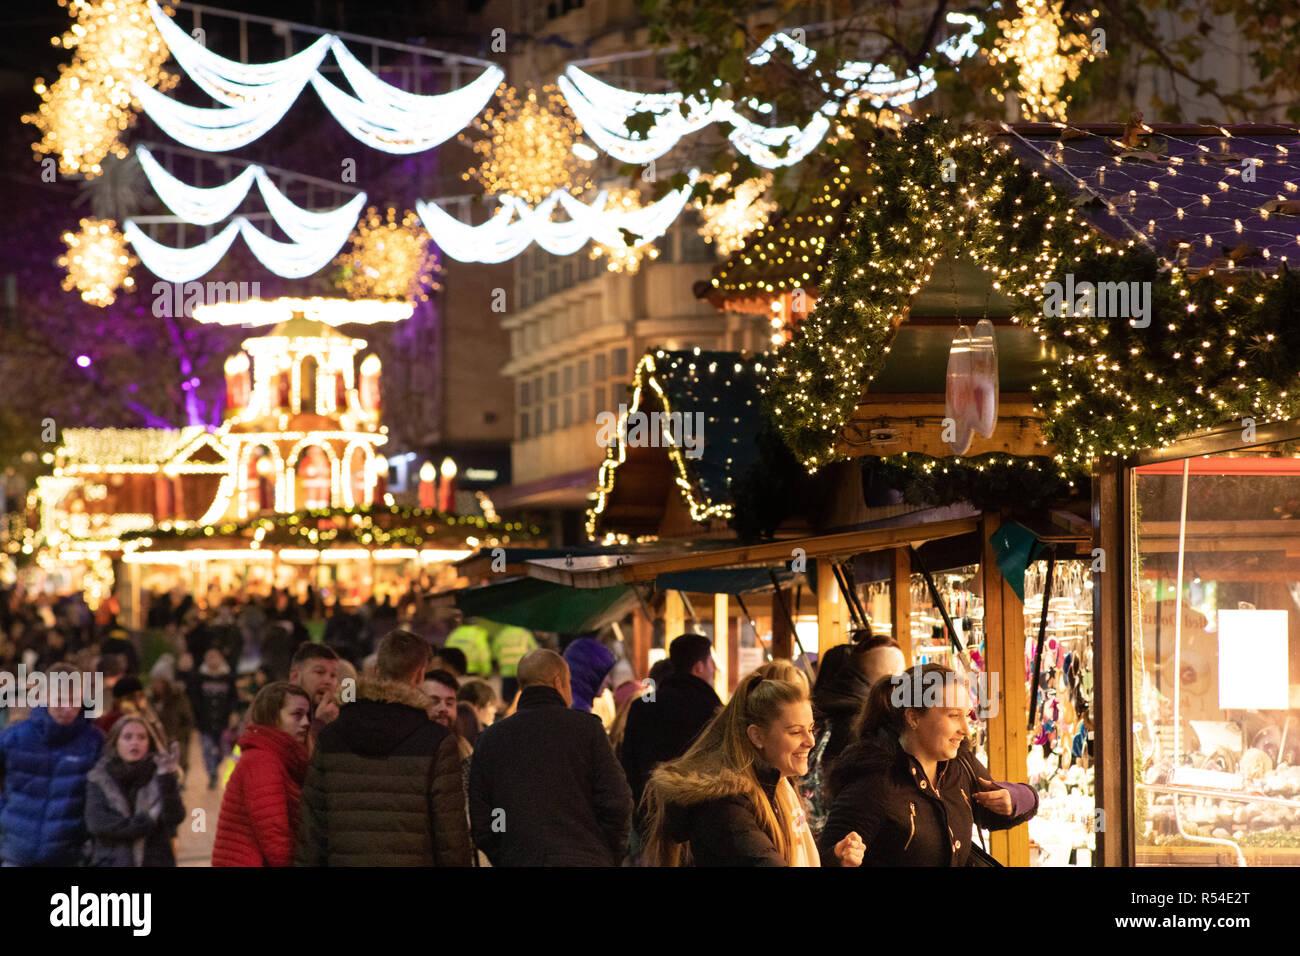 Birmingham Christmas Lights.Christmas Lights Surrounding The Frankfurt German Market On